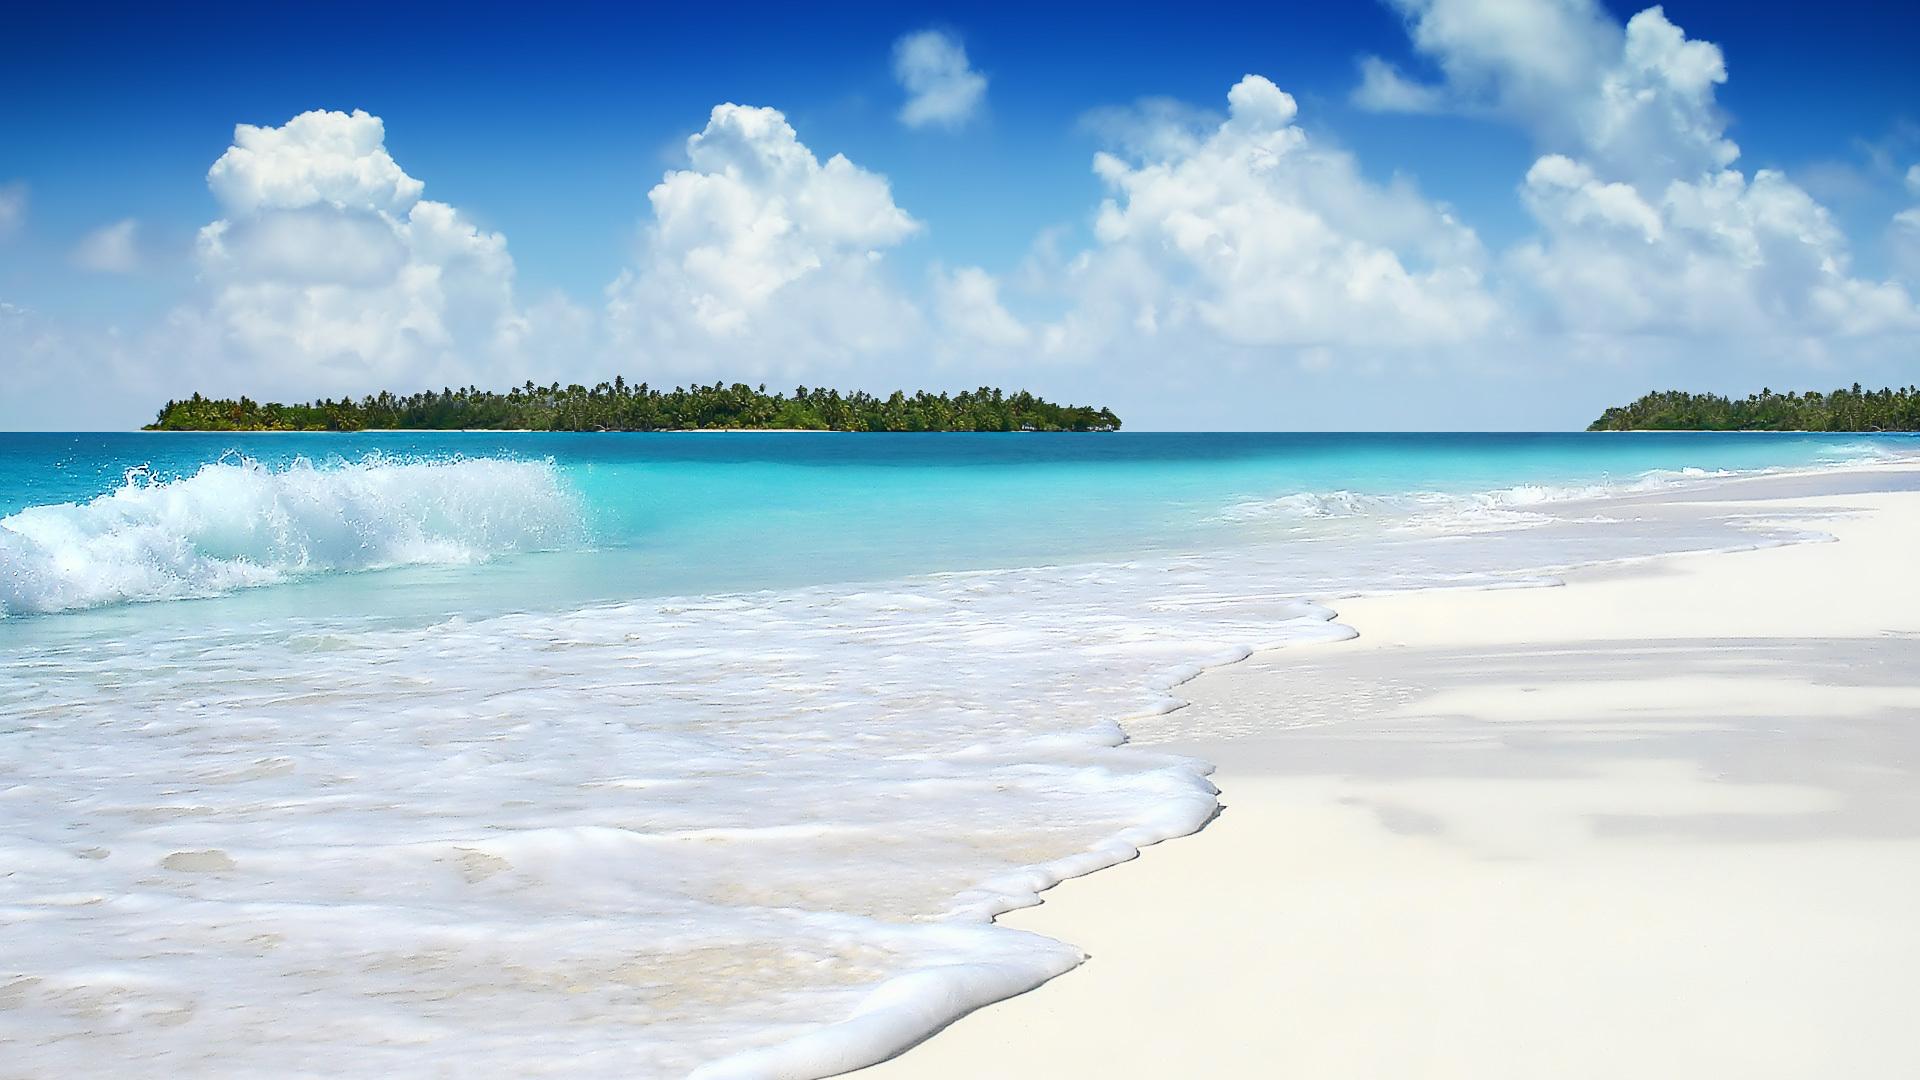 maldives beach, beautiful in summer full hd wallpaper and